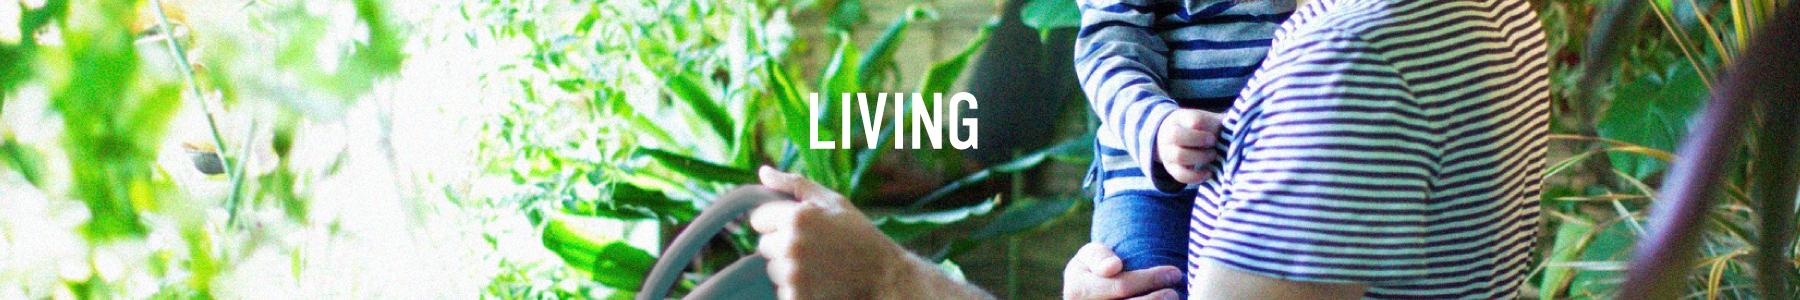 Pc living